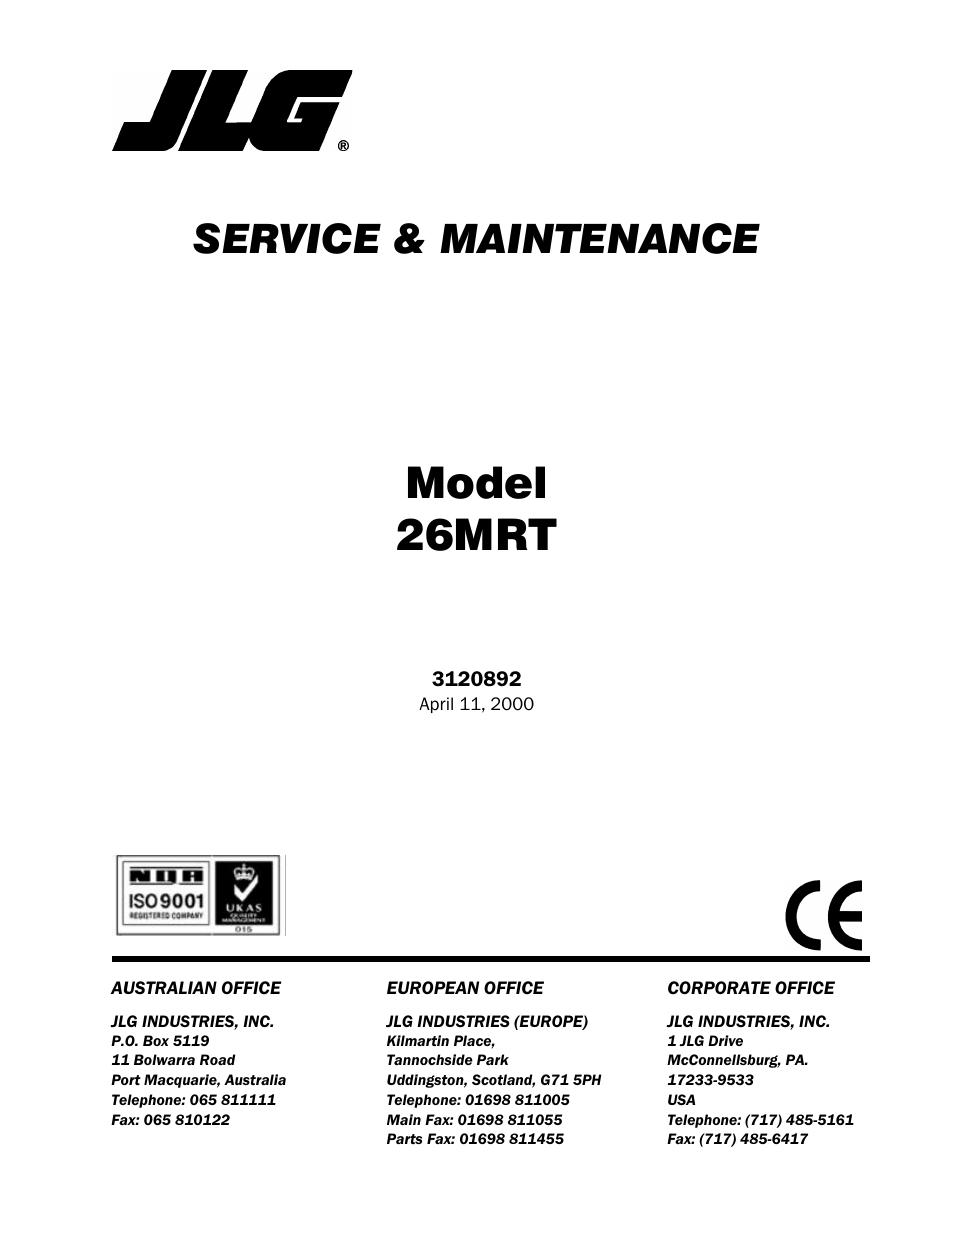 Jlg 26mrt Service Manual User Manual